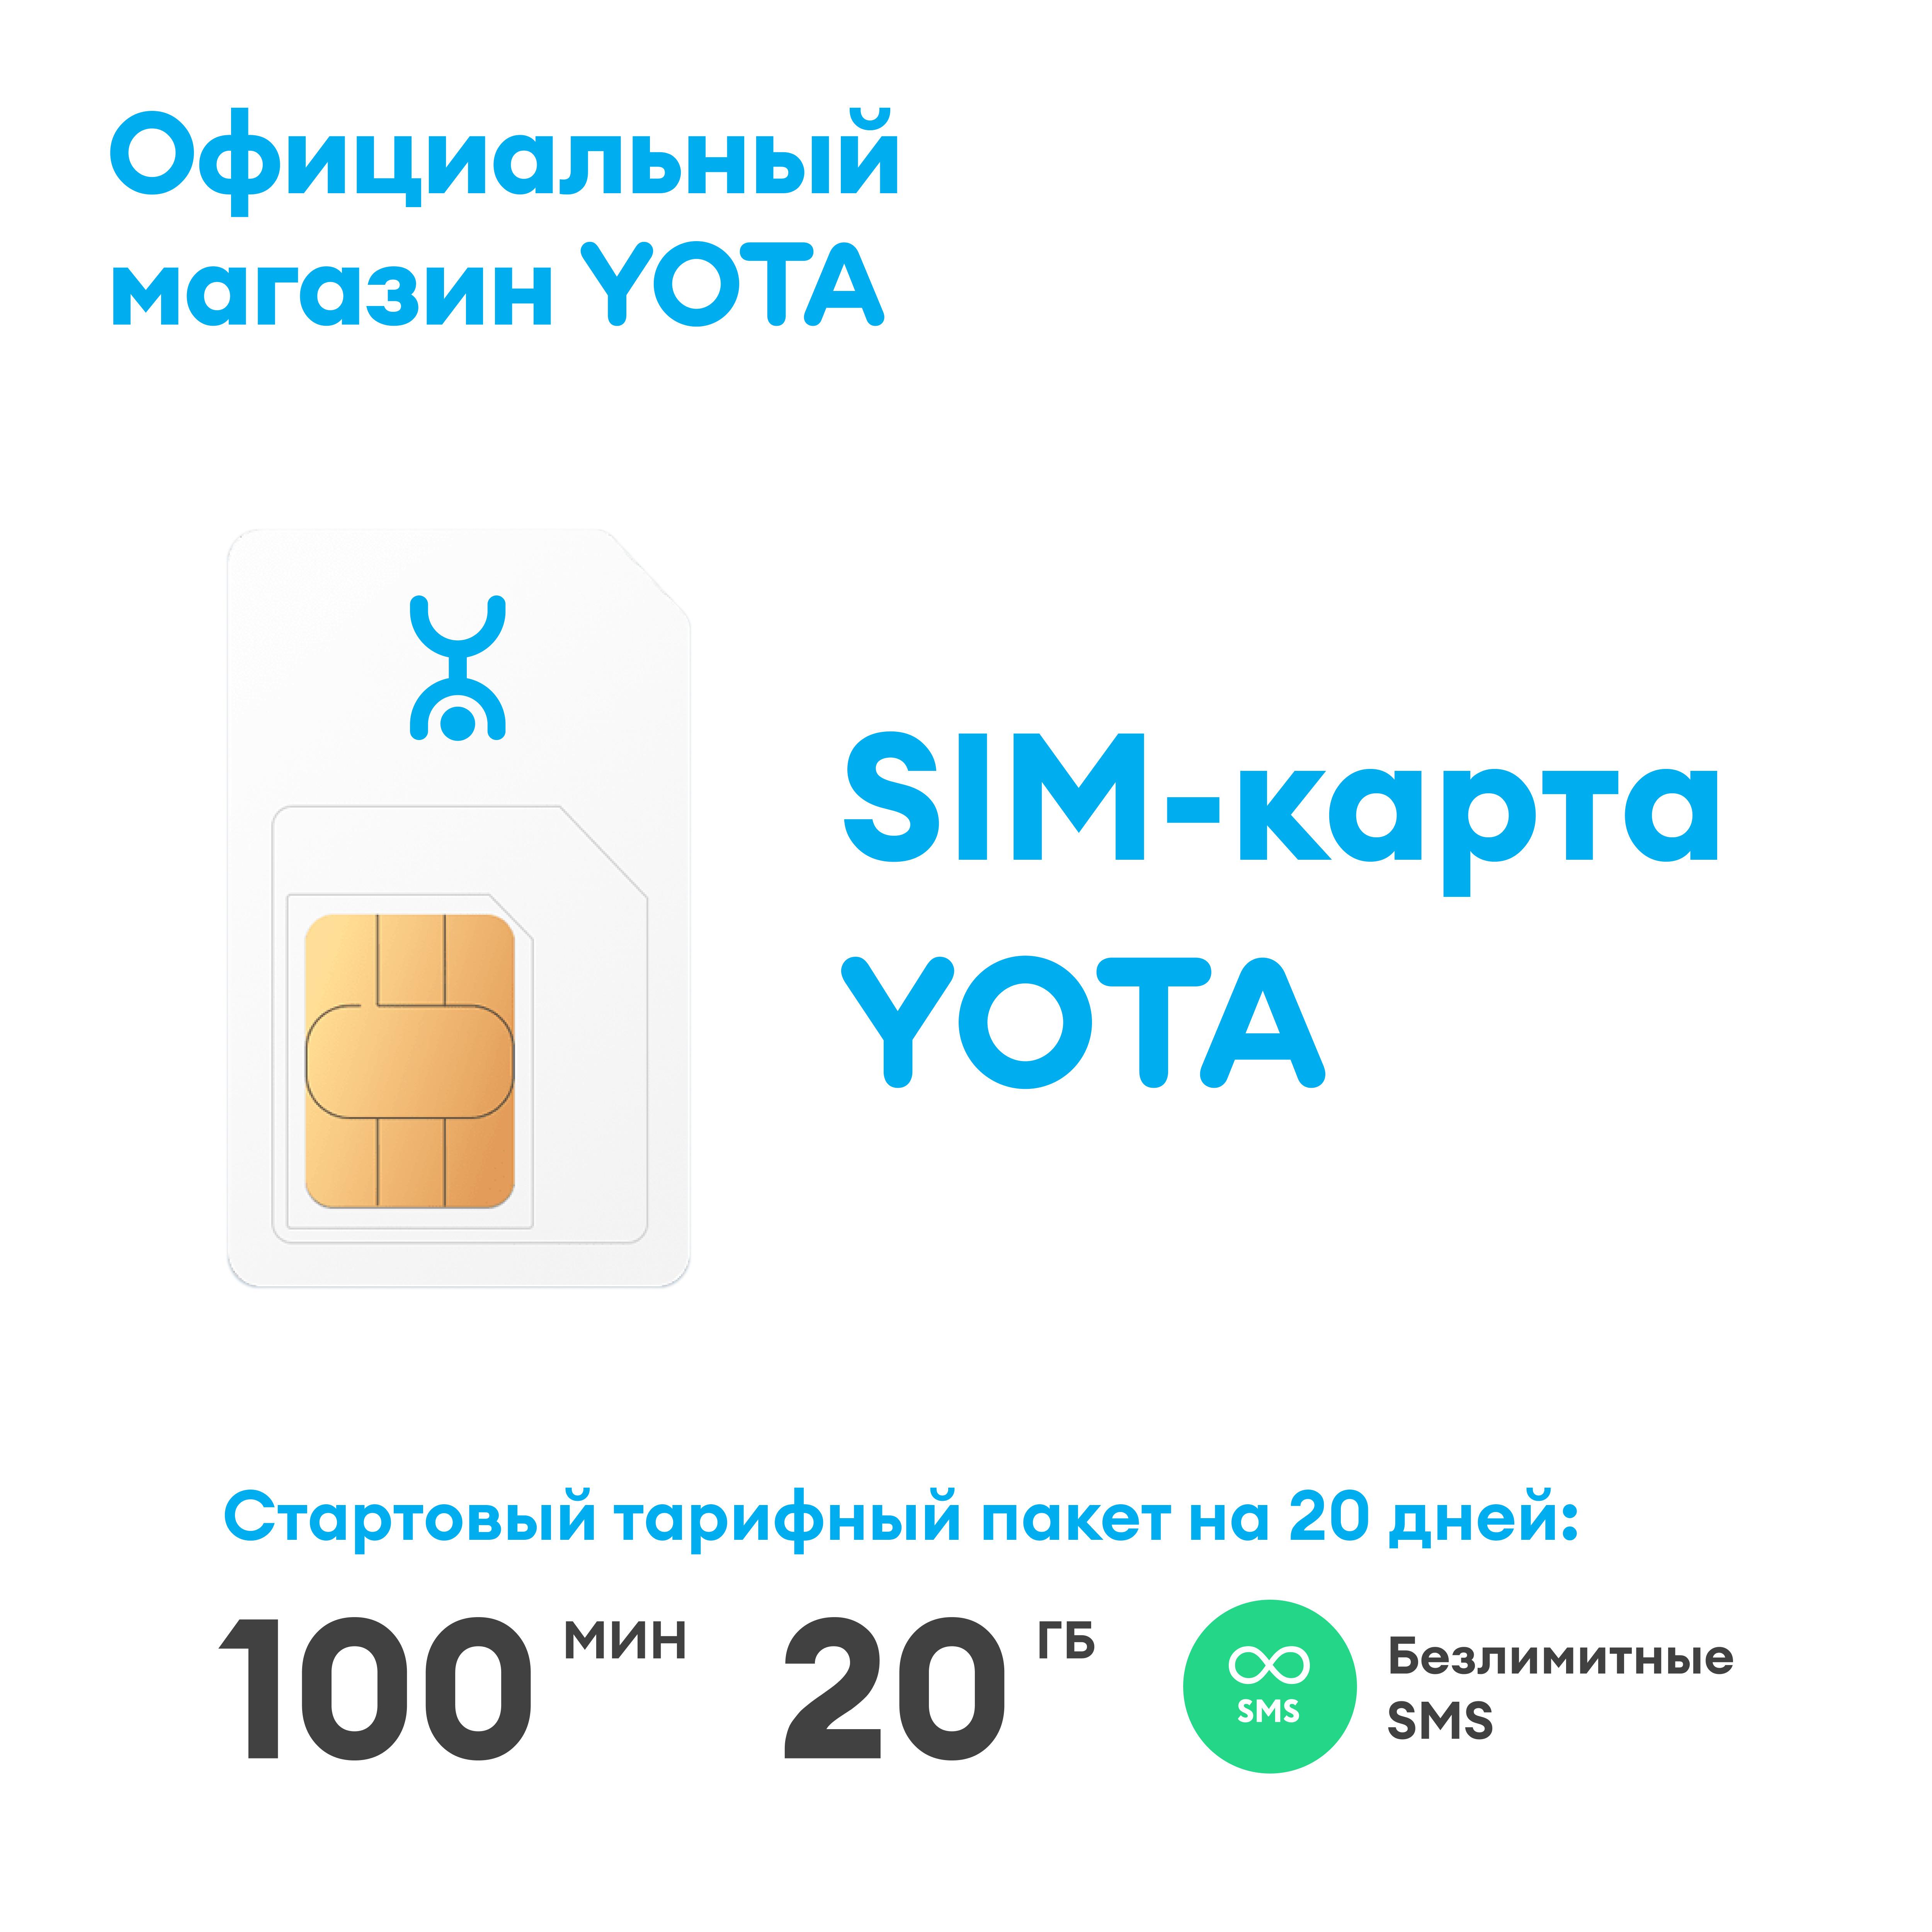 sim-карта yota(вся россия)